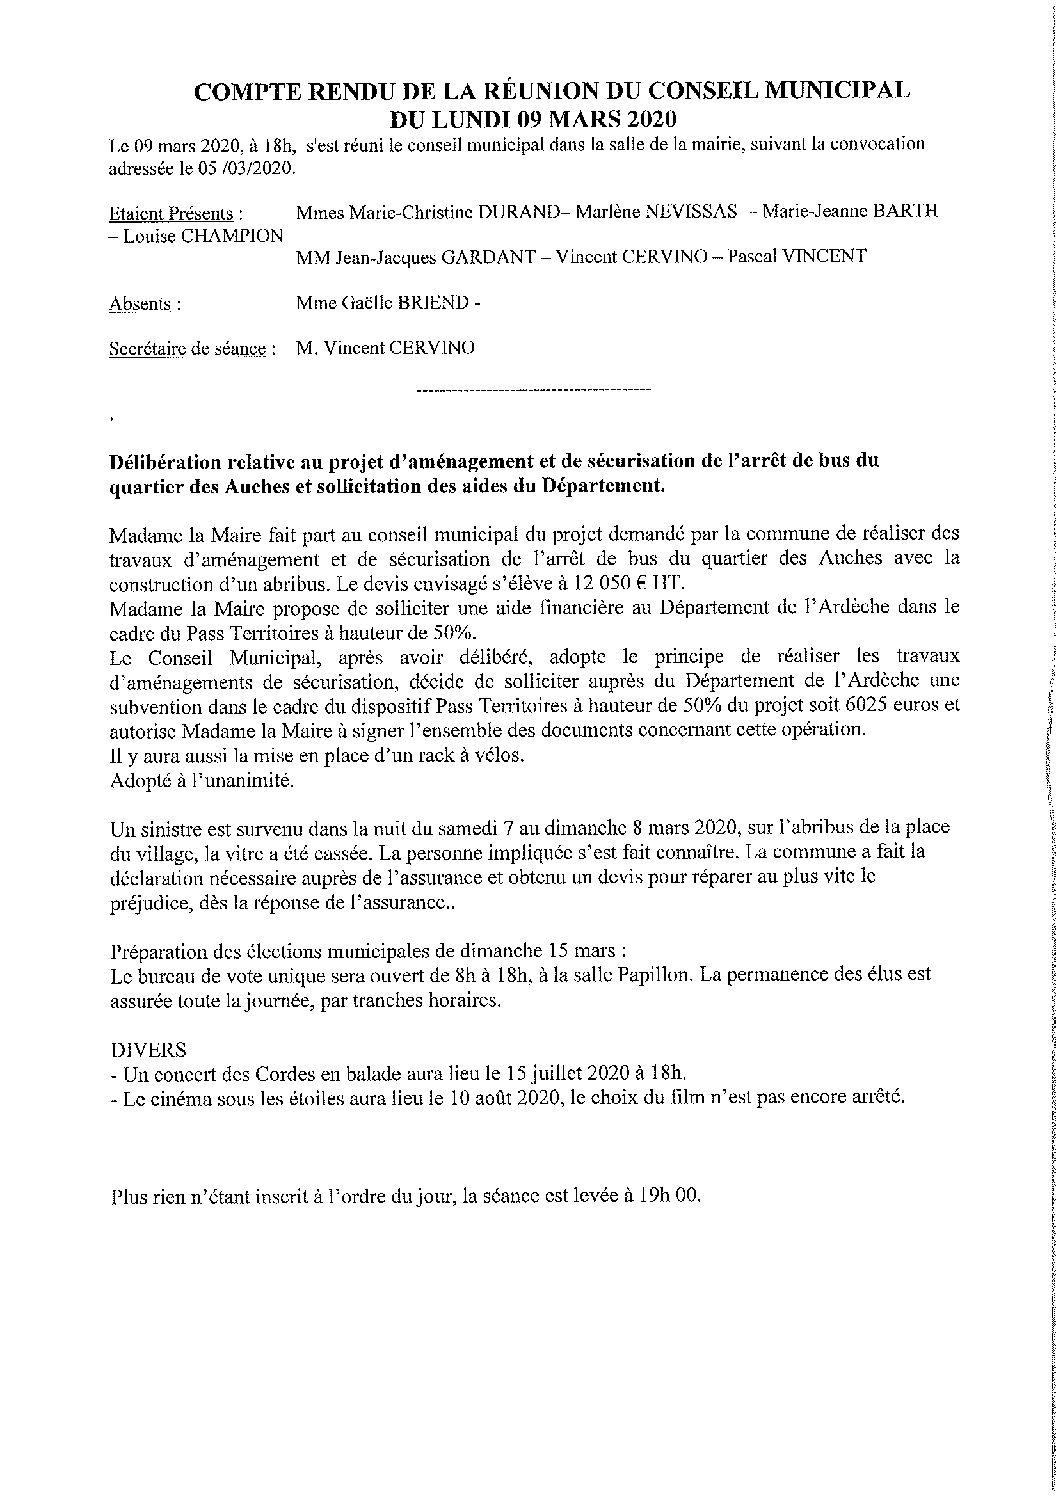 compte rendu Conseil Municipal du 09 mars 2020